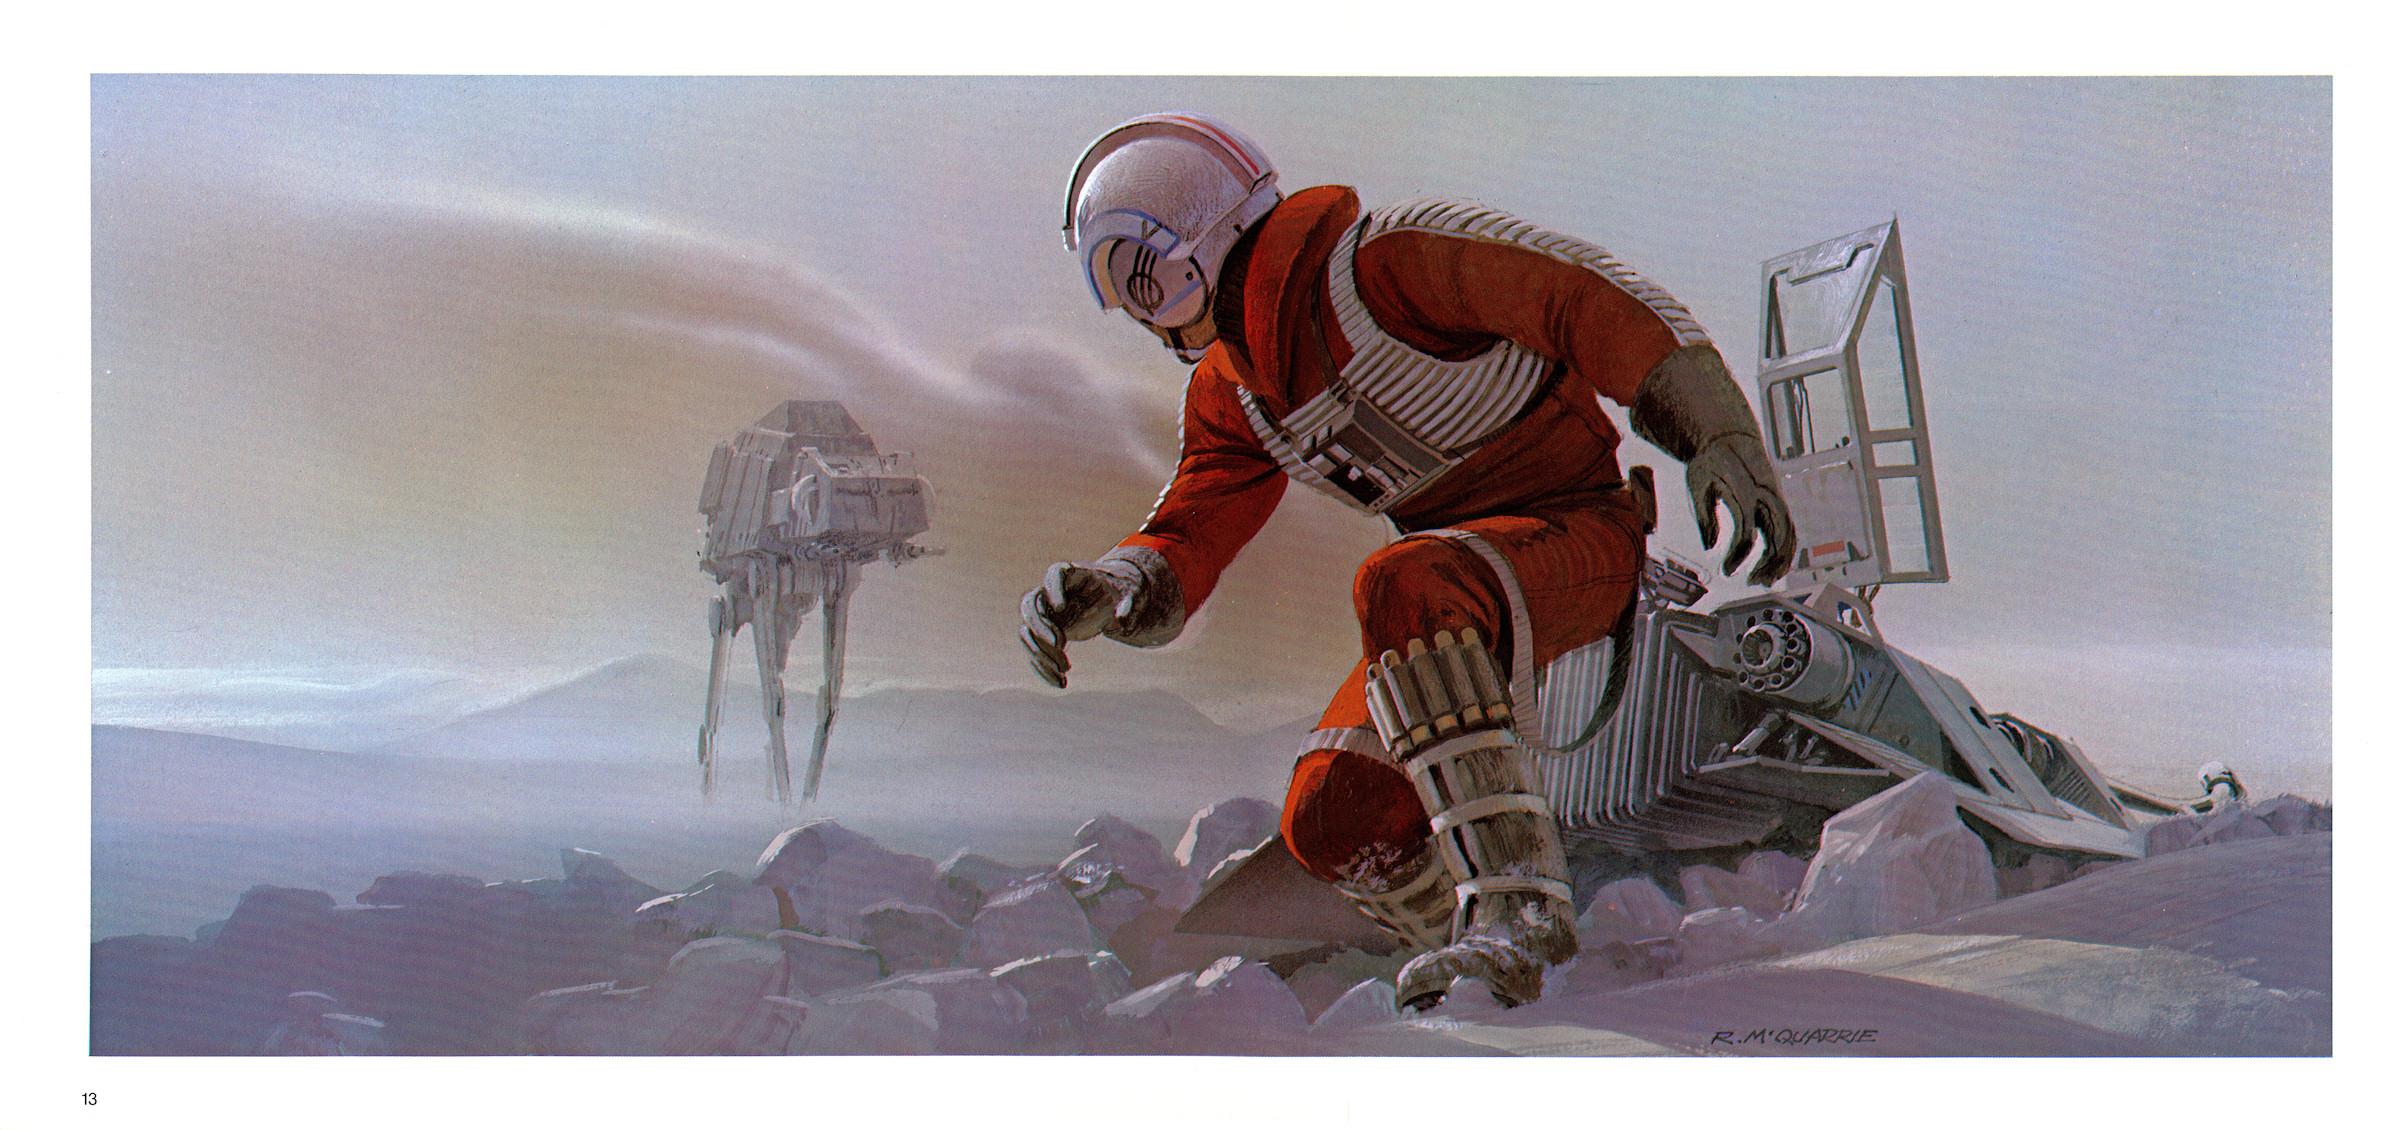 Star Wars Luke Skywalker Hoth Snow Speeder Ralph McQuarrie wallpaper 2400x1130